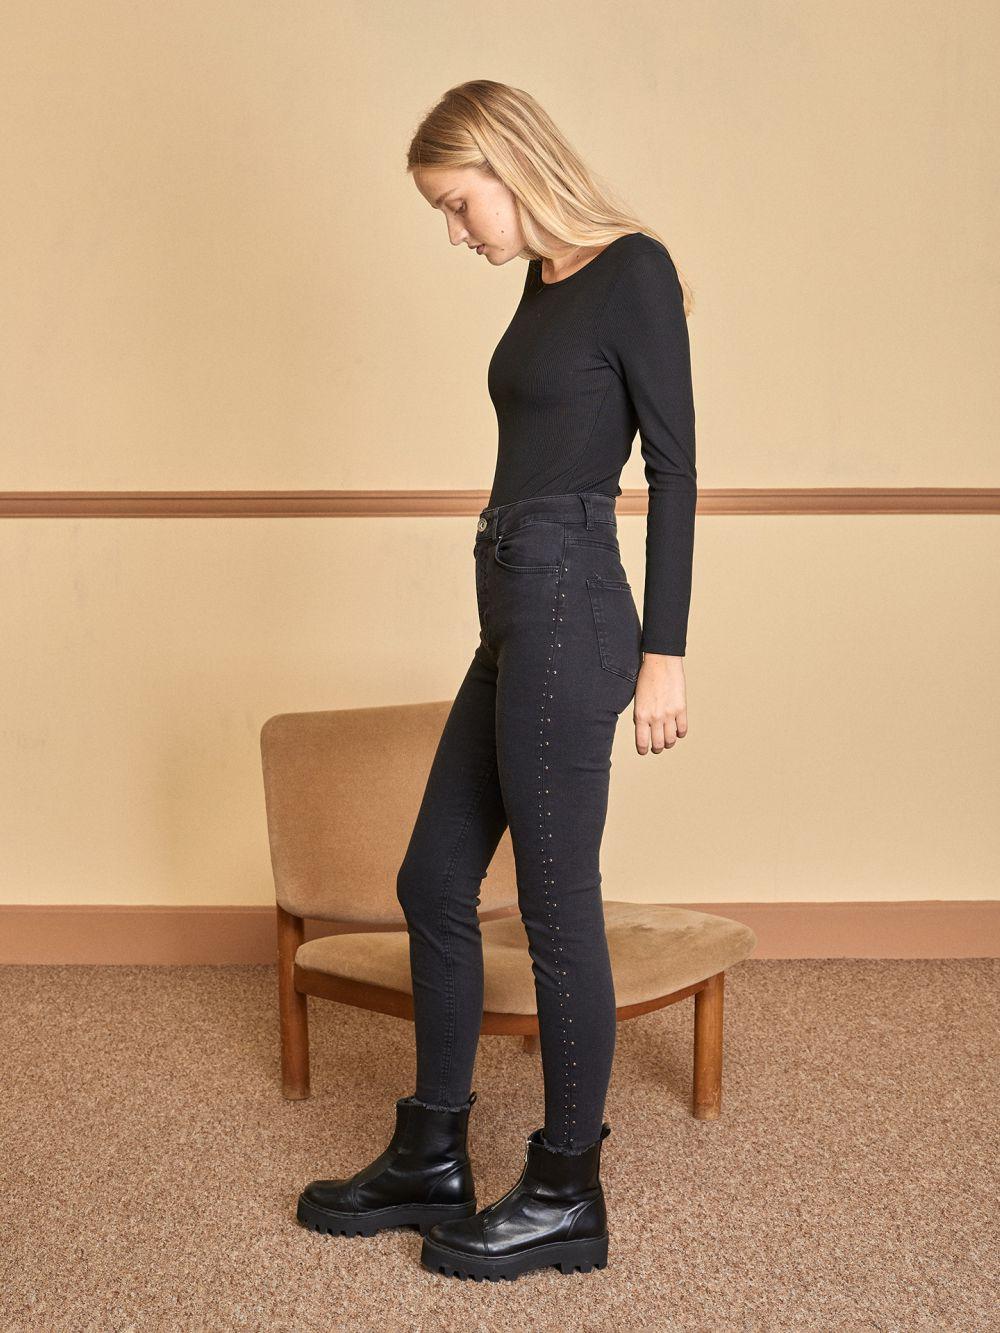 ג'ינס Skinny עם ניטים בצדדים